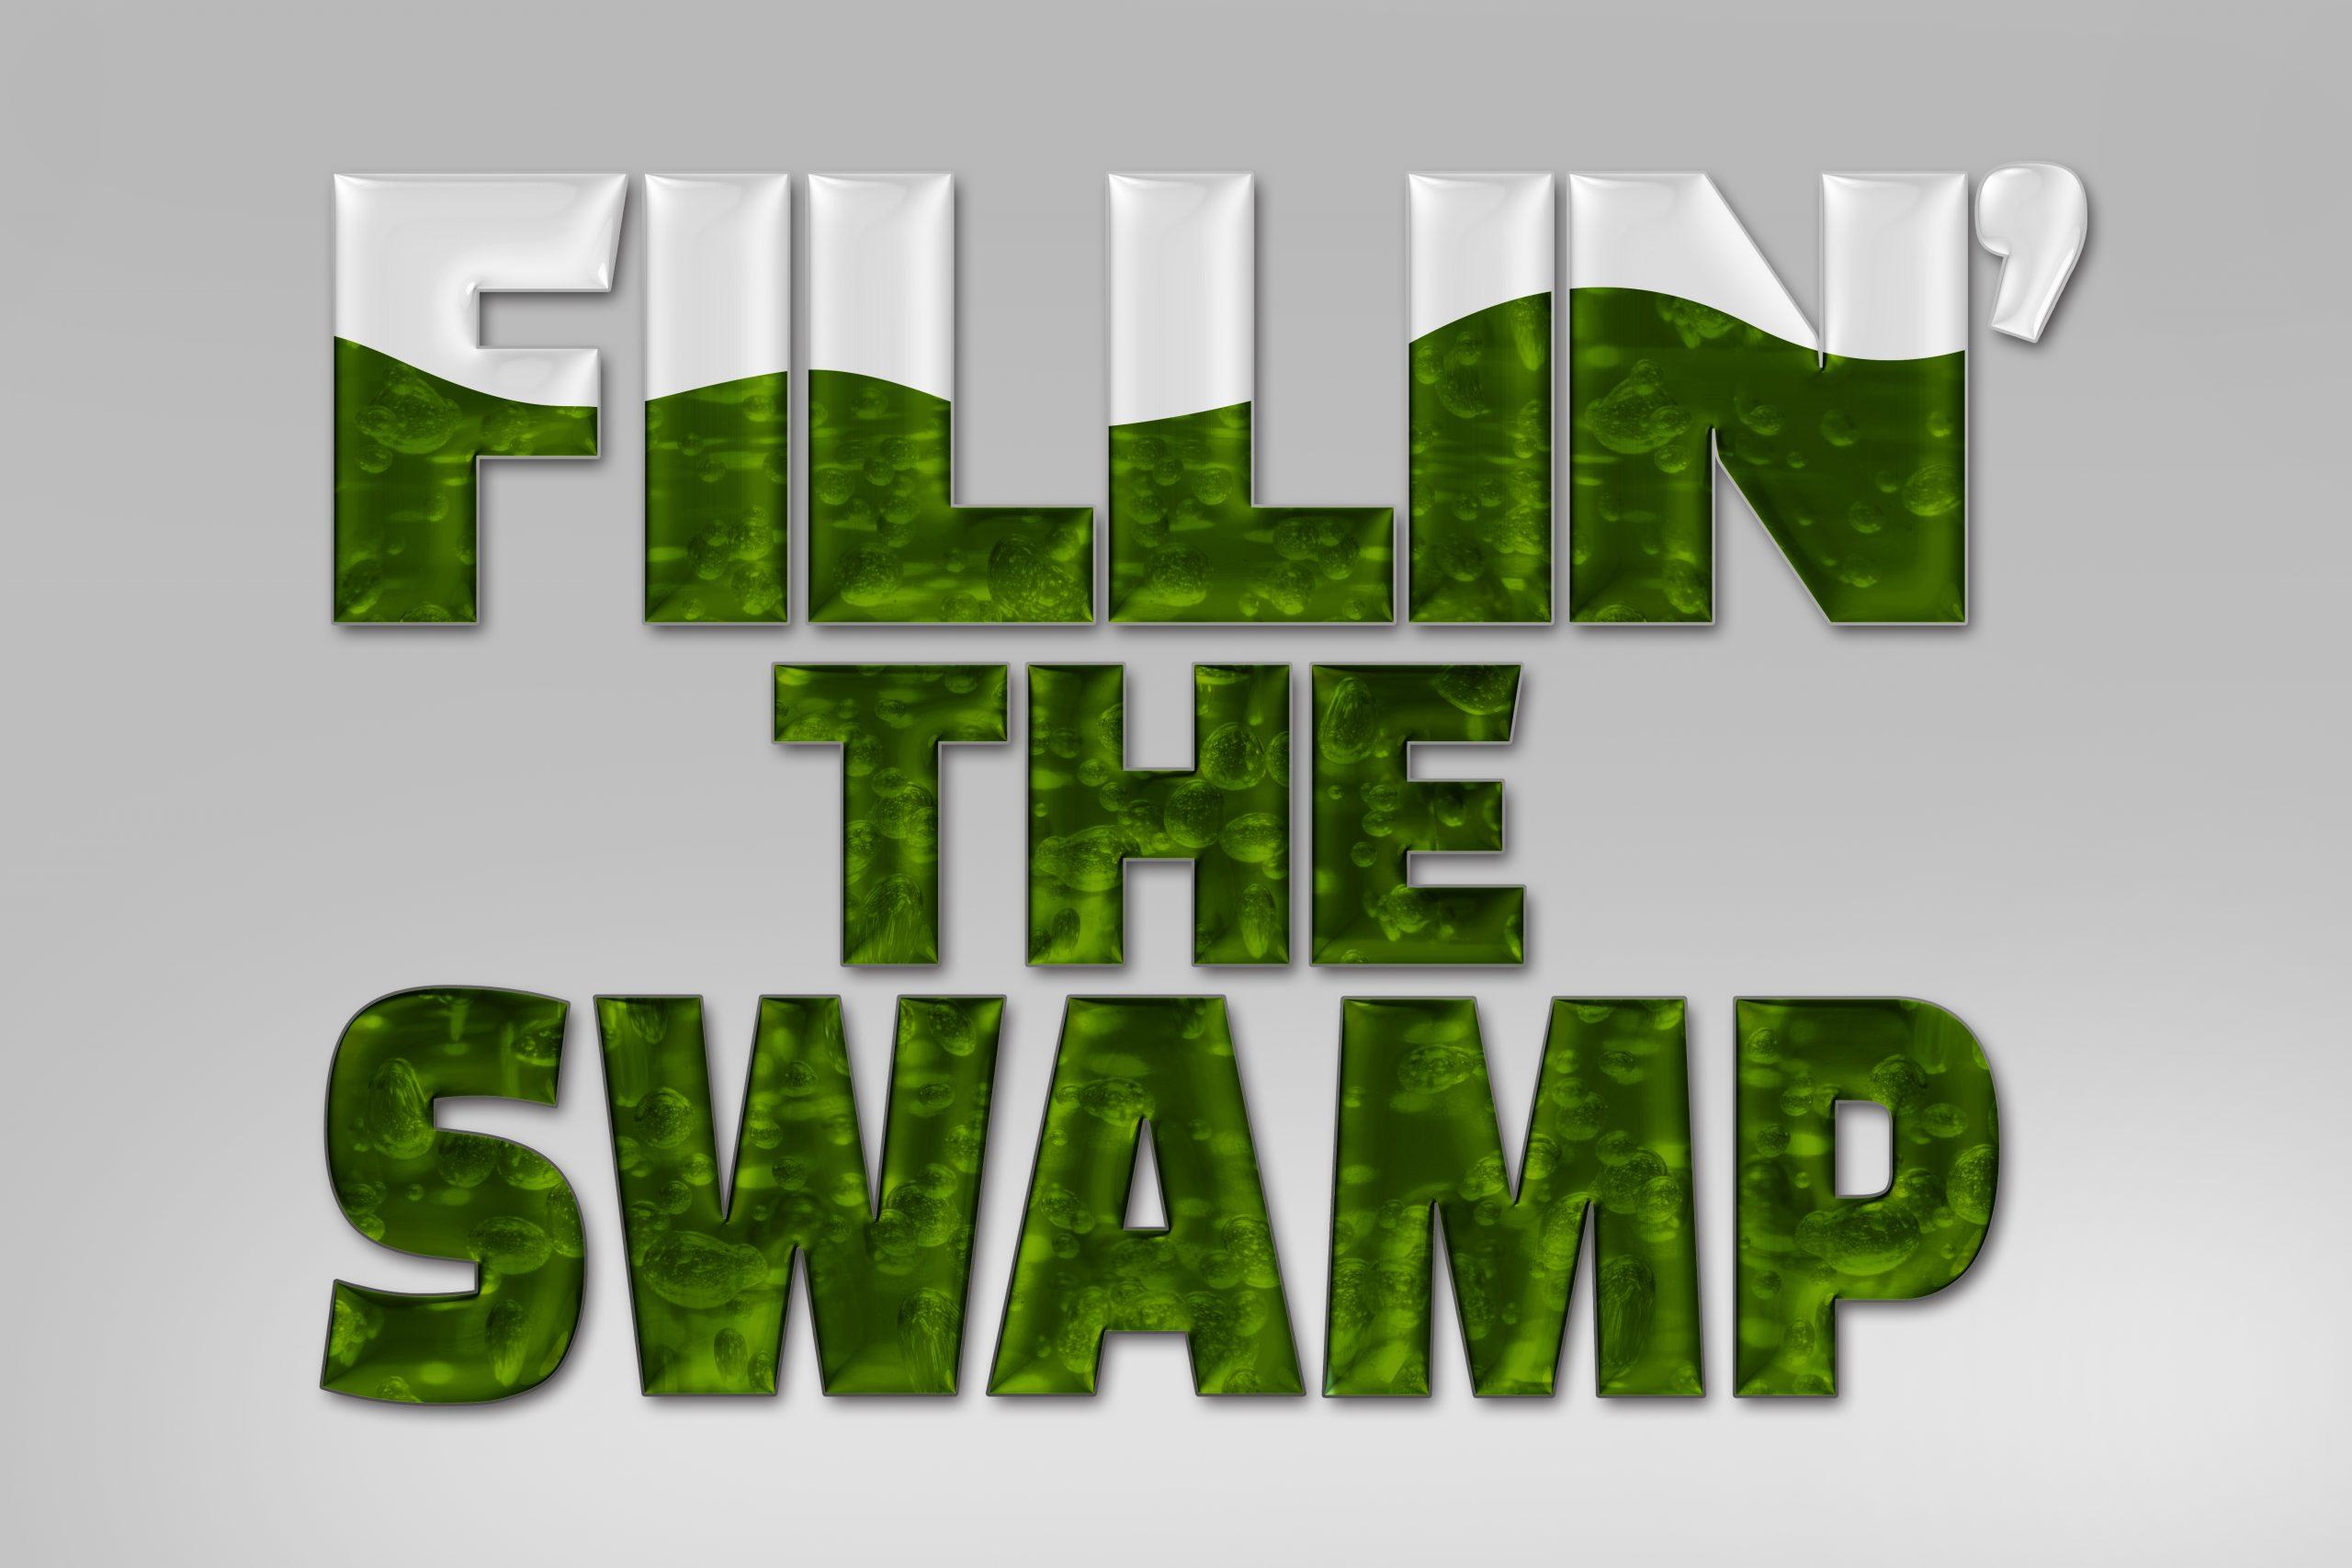 Donald Trump Makes the Swamp Bigger